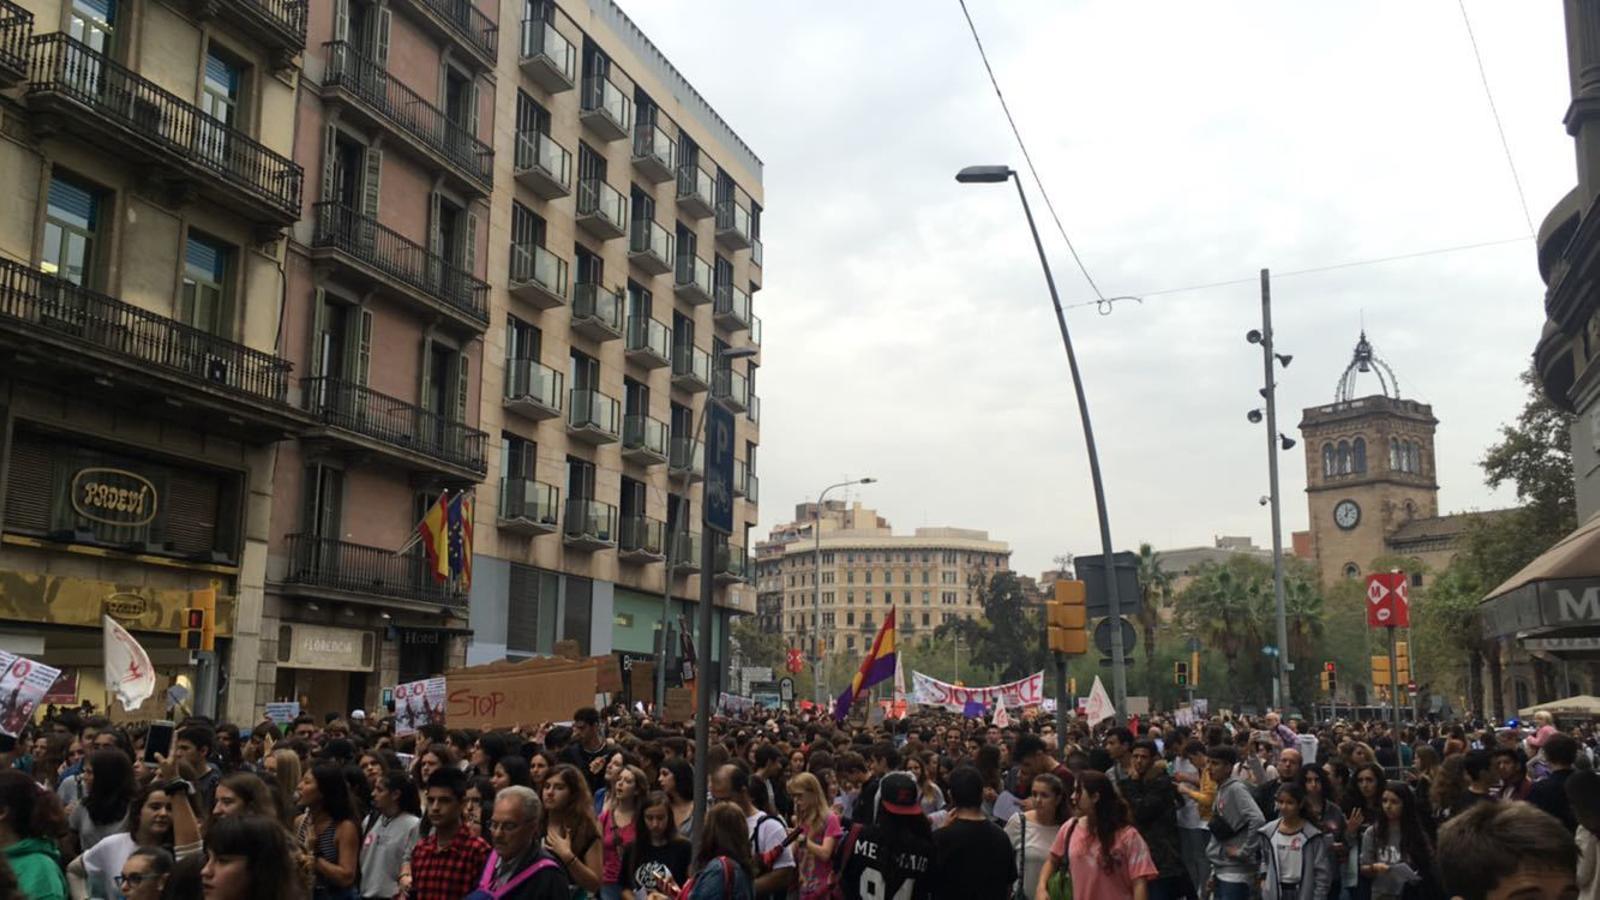 M s de estudiants es manifesten contra la lomce a - Placa universitat barcelona ...